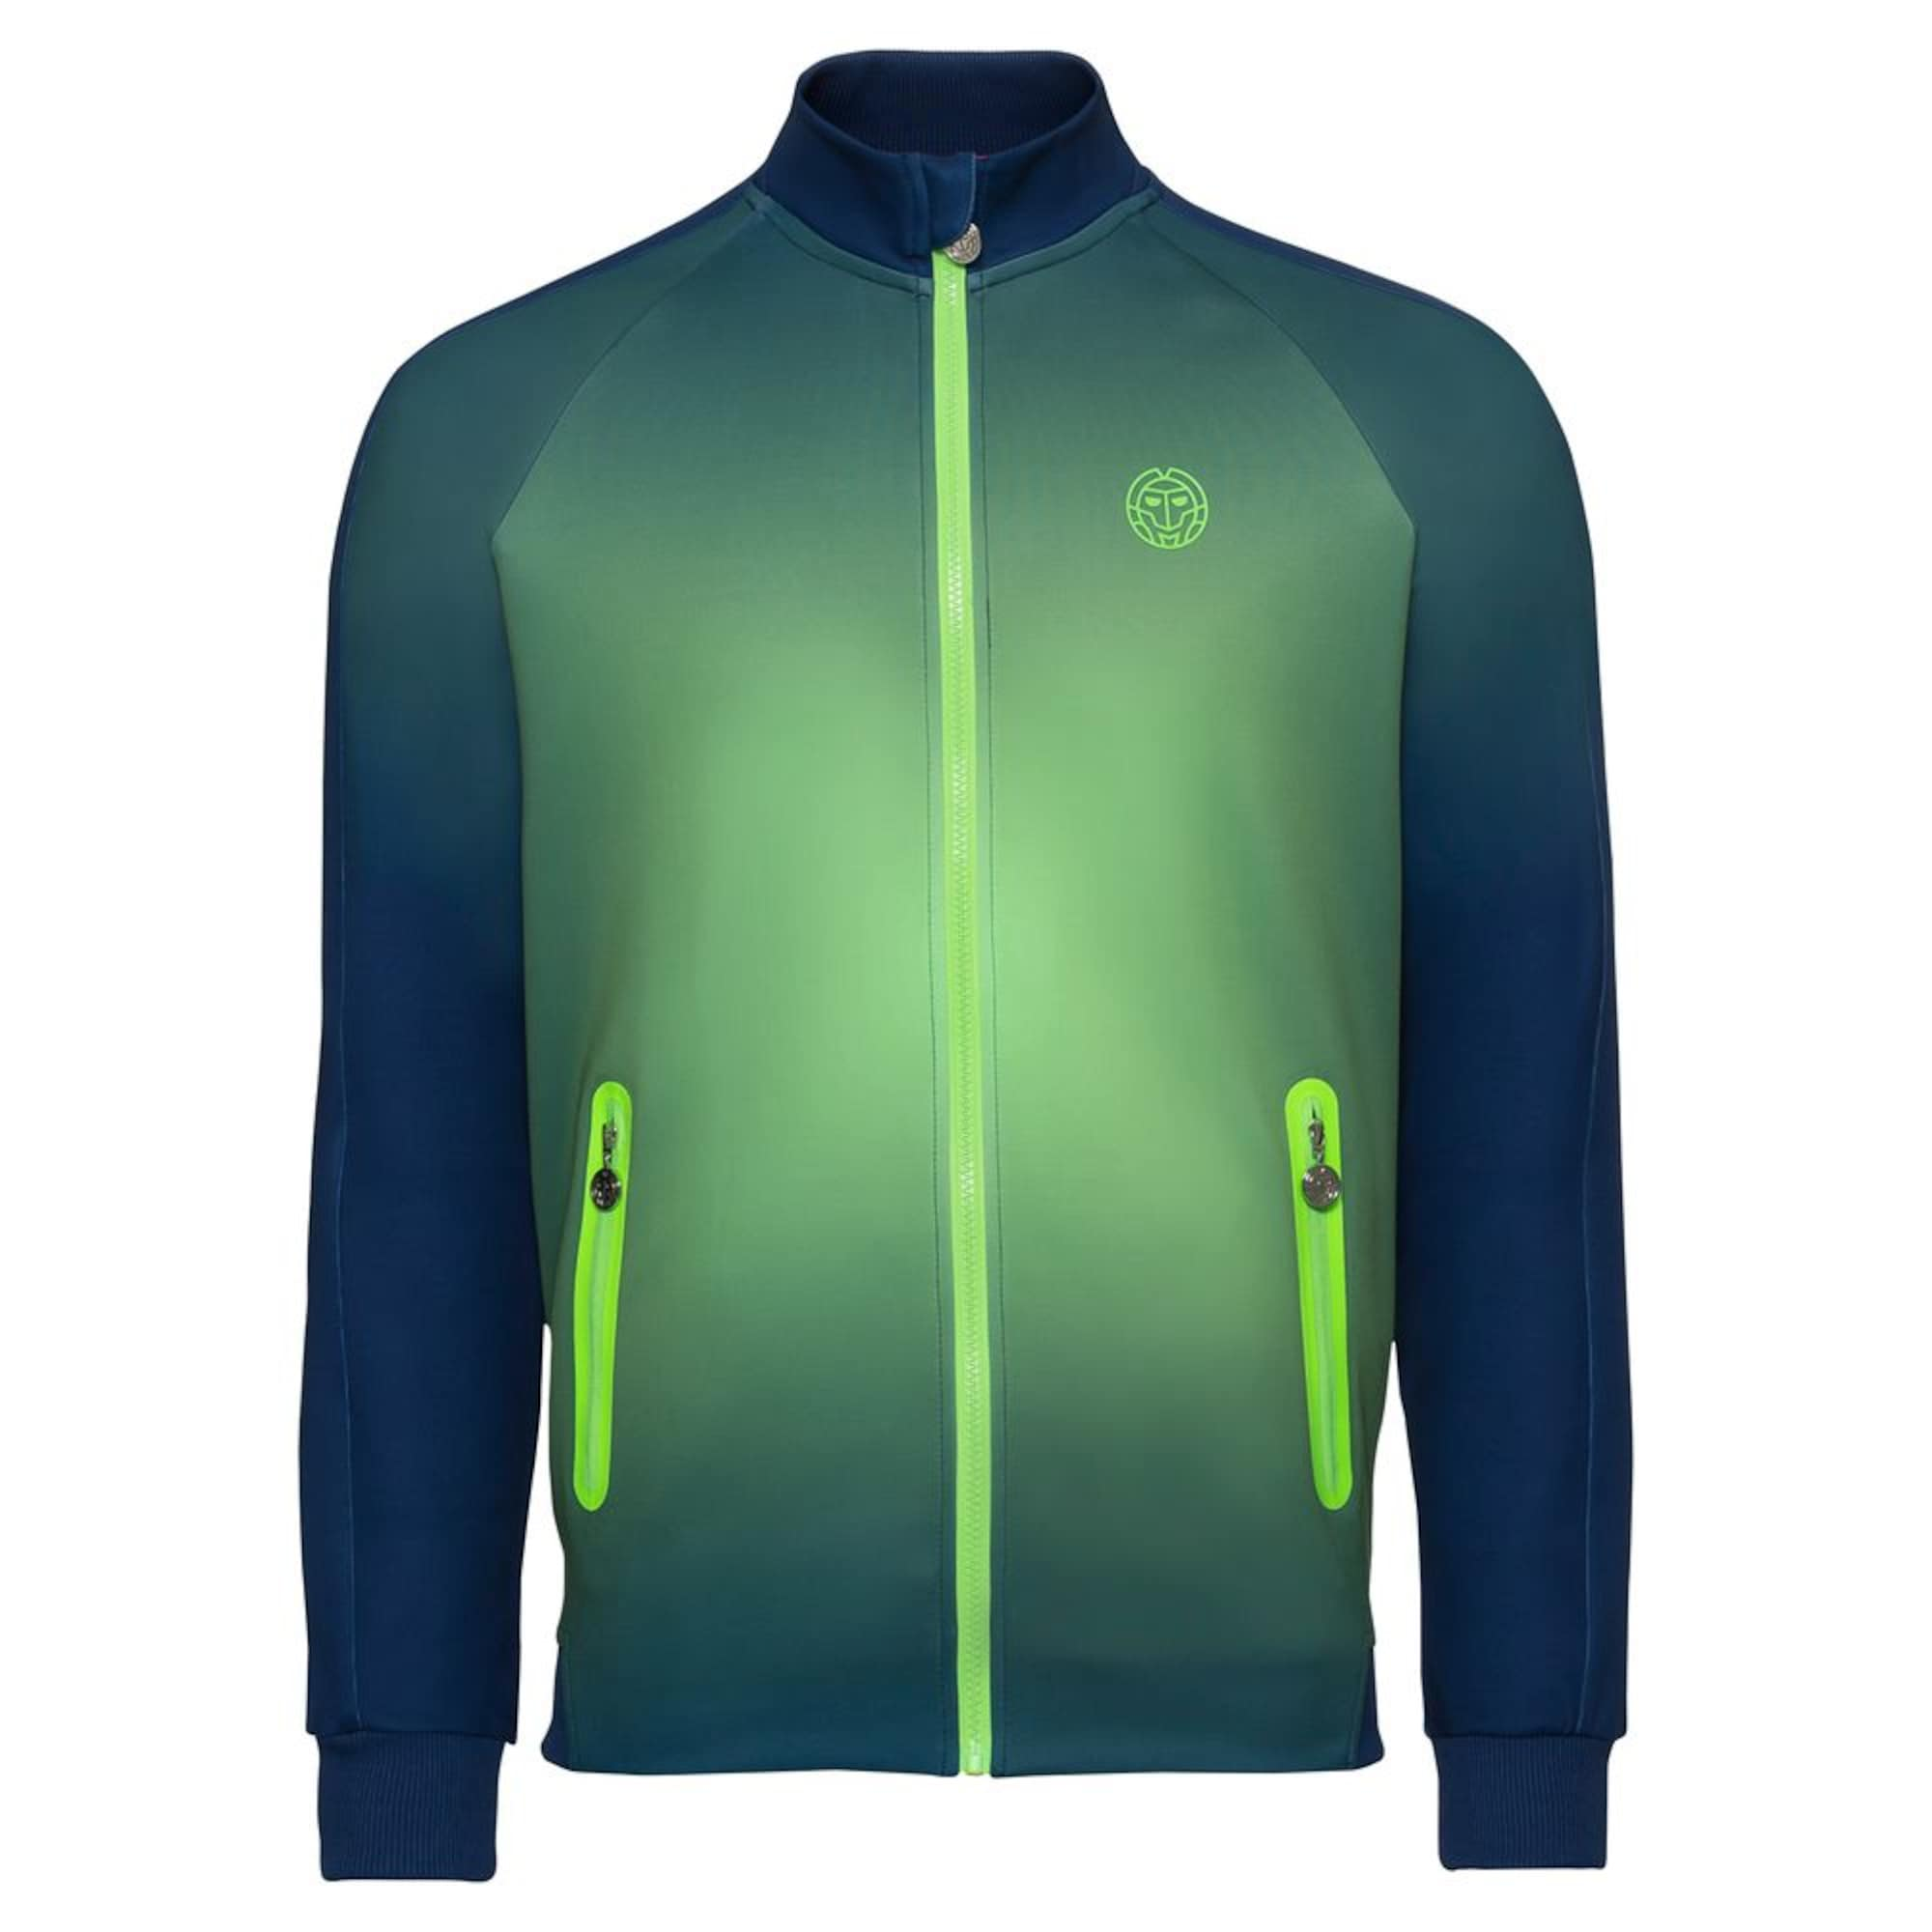 Trainingsjacke Aton Tech mit Stehkragen   Sportbekleidung > Sportjacken > Trainingsjacken   Blau - Grün   BIDI BADU